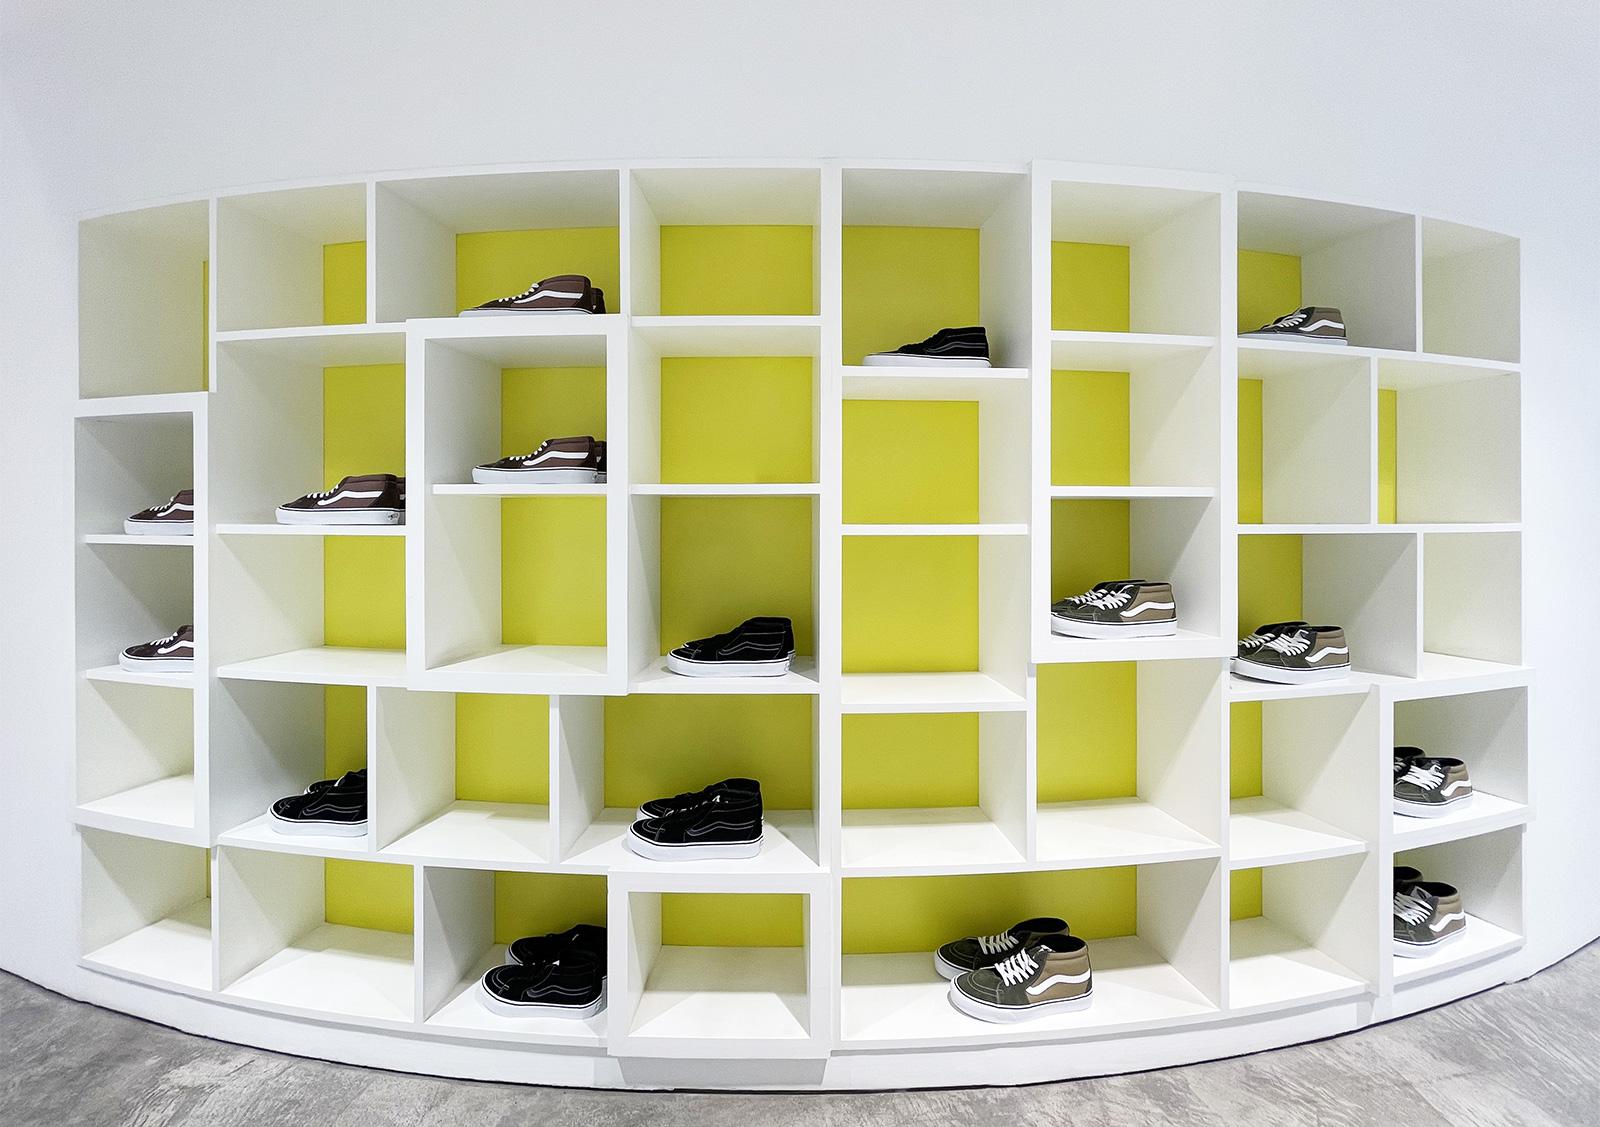 DSMB Sneaker Space